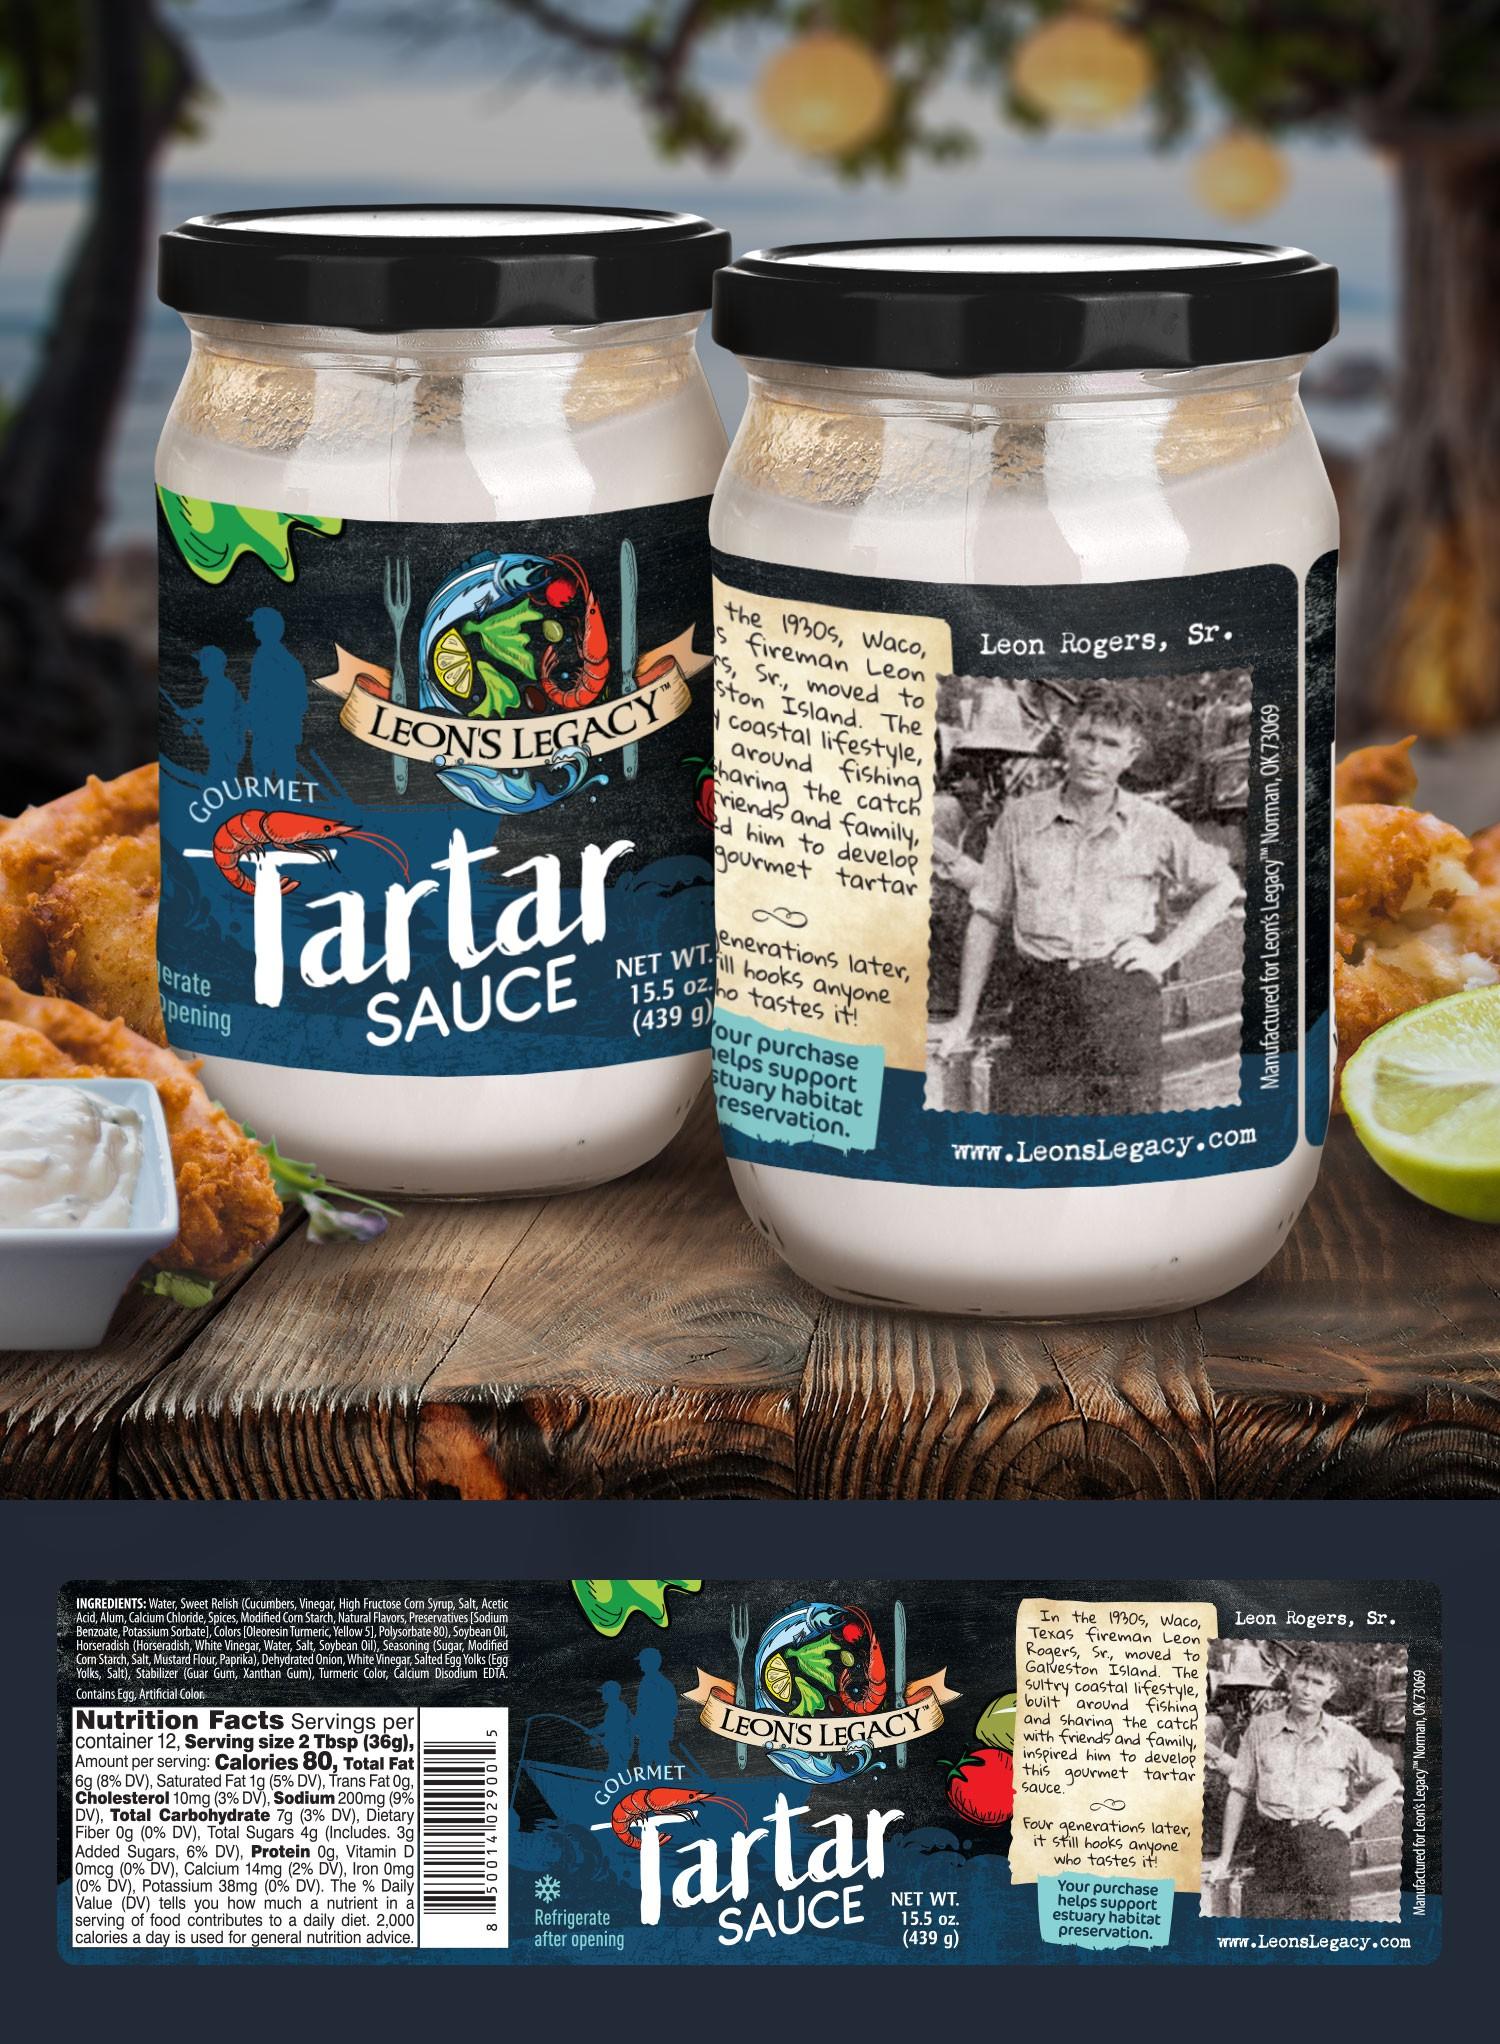 Leon's Legacy Gourmet Tartar Sauce Label Revisions